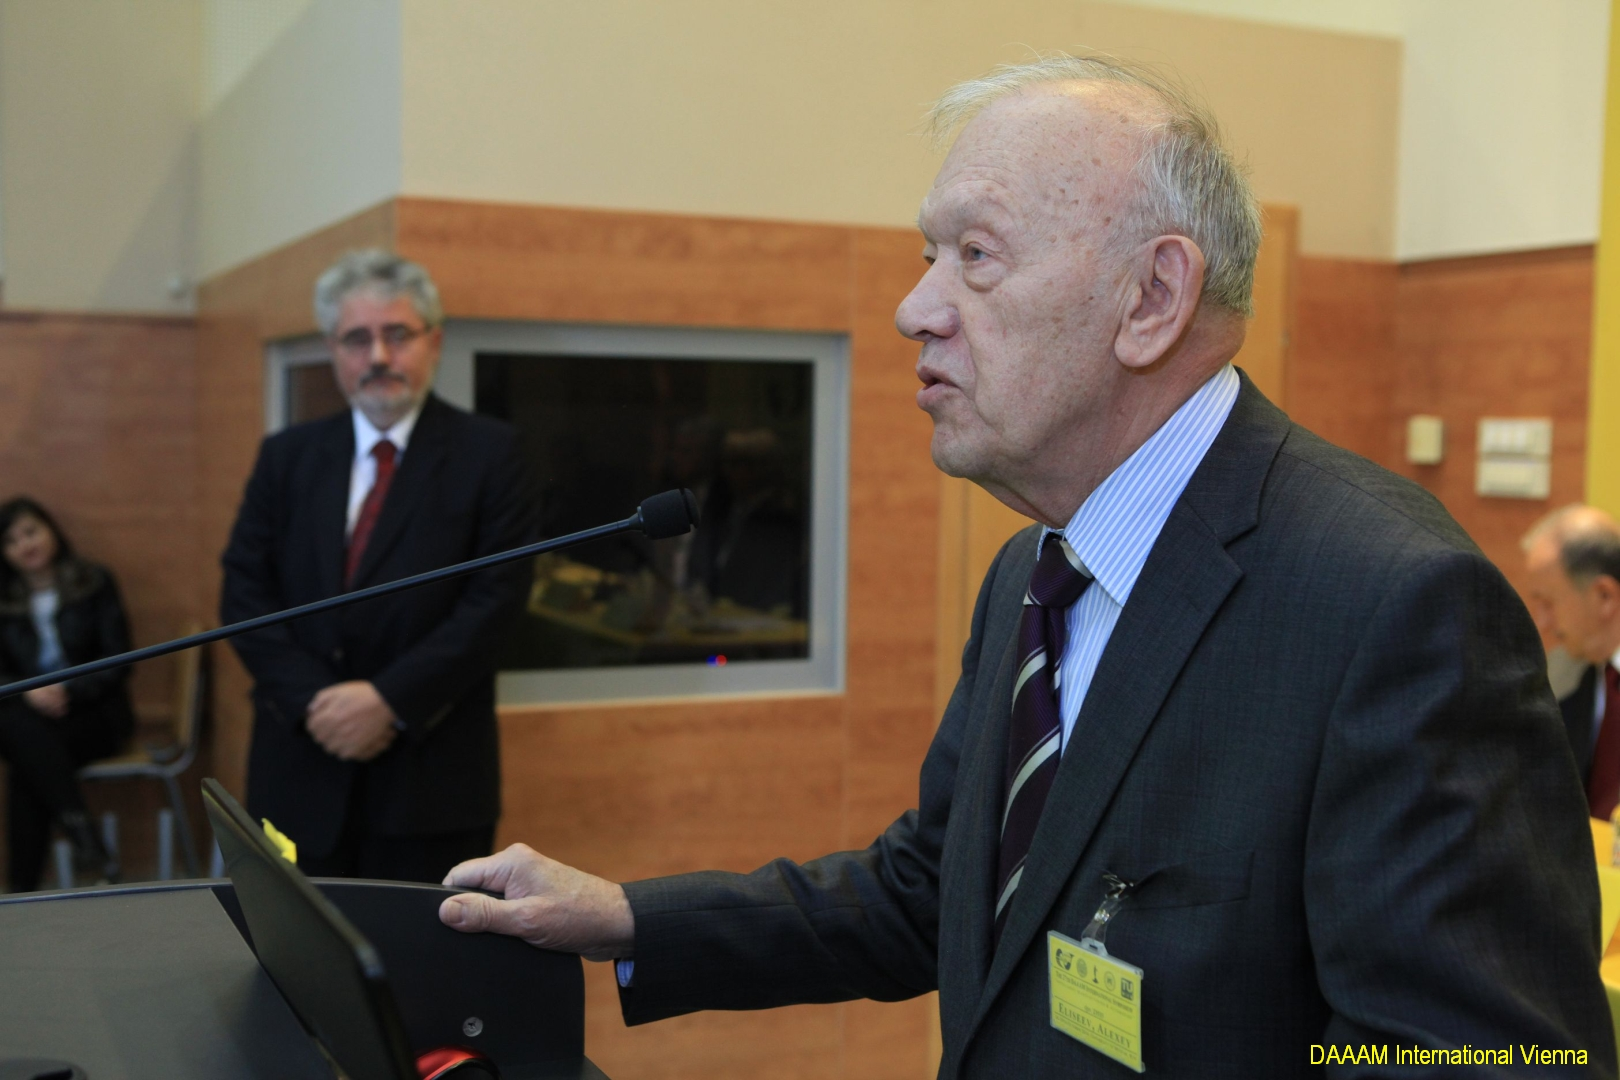 DAAAM_2016_Mostar_06_Professor_and_Cosmonaut_Alexey_Eliseev_Doctor_honors_causa_032